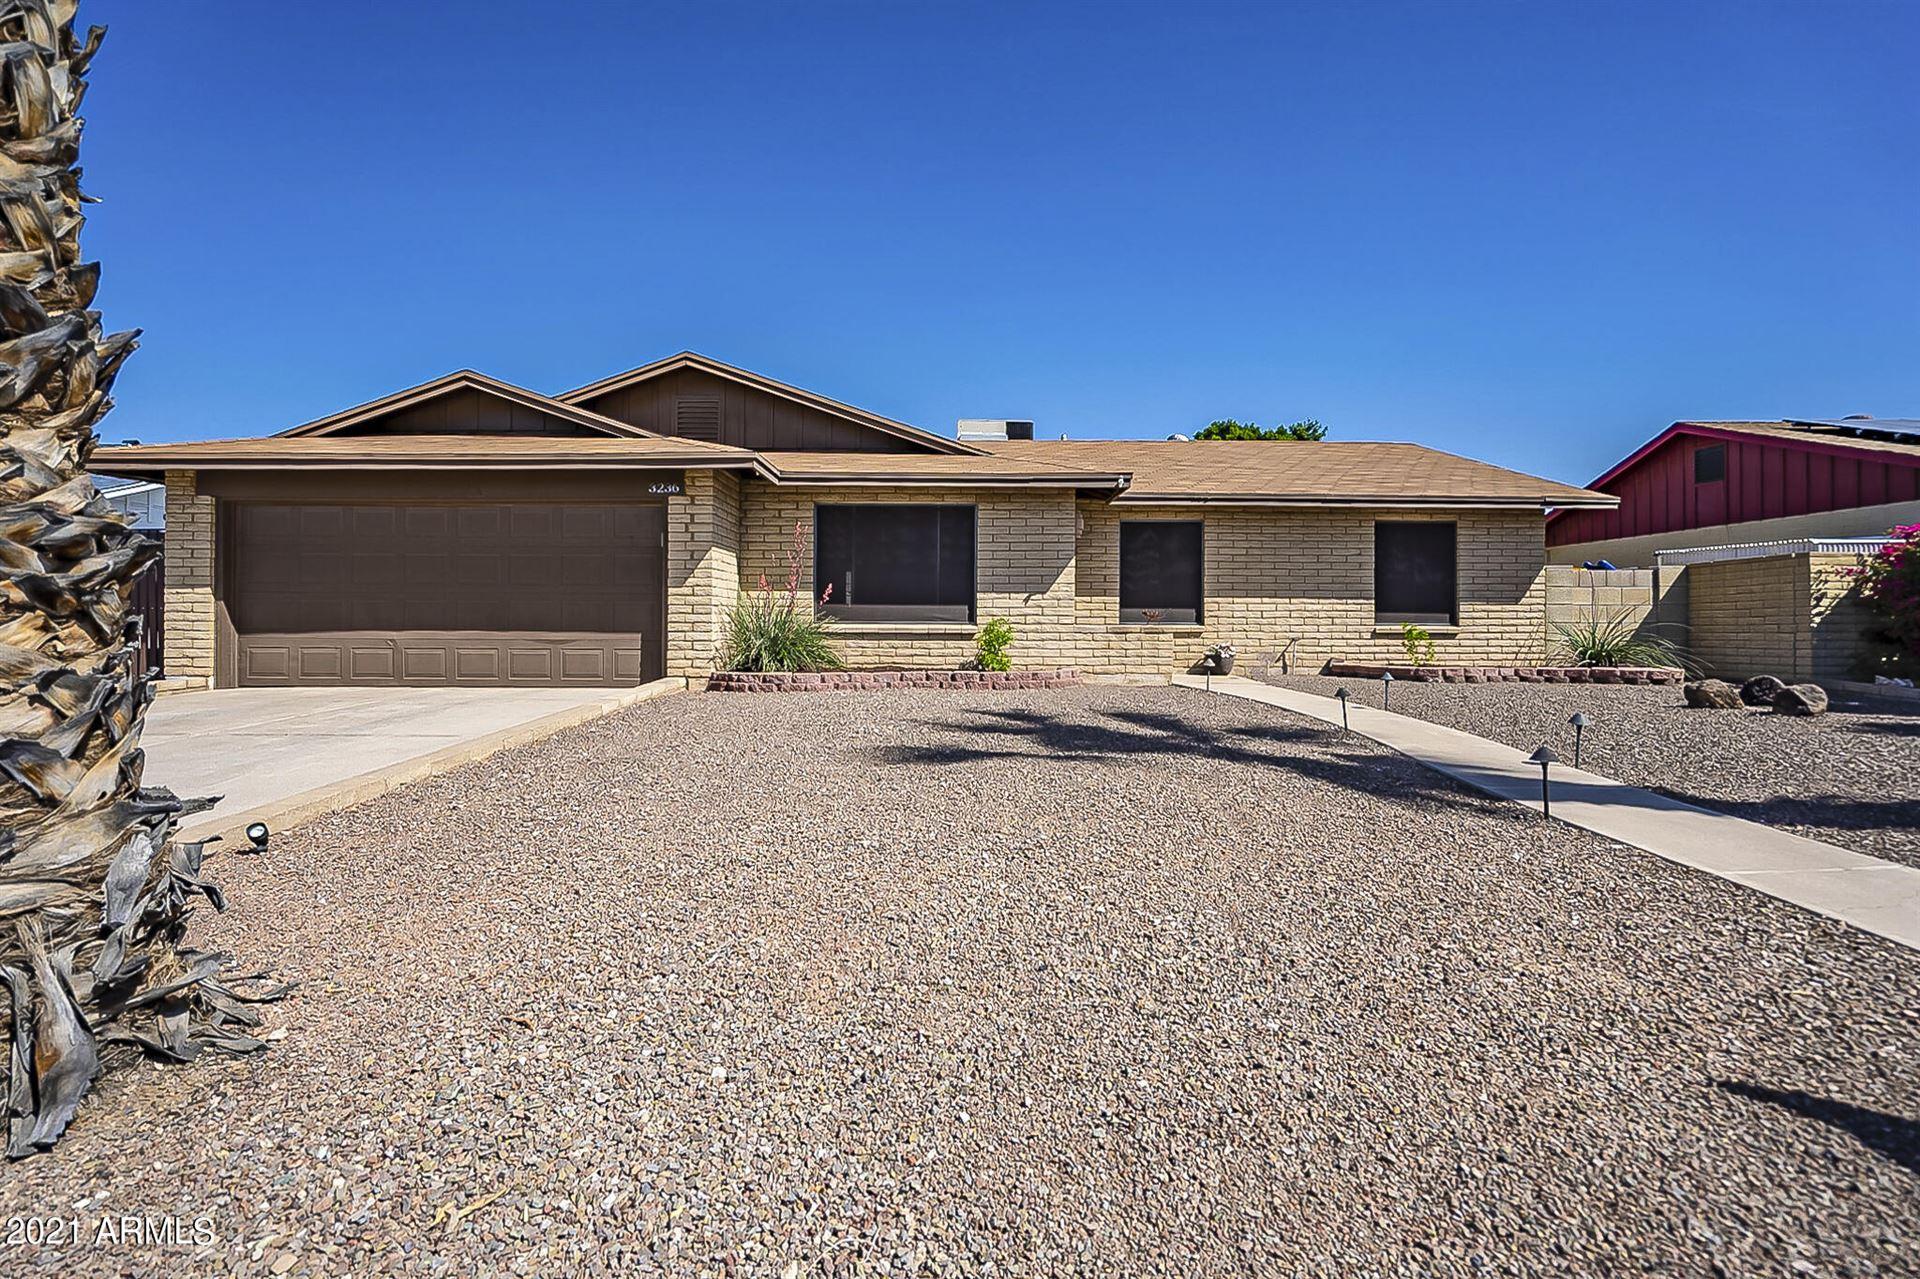 3236 W YUCCA Street, Phoenix, AZ 85029 - MLS#: 6232225